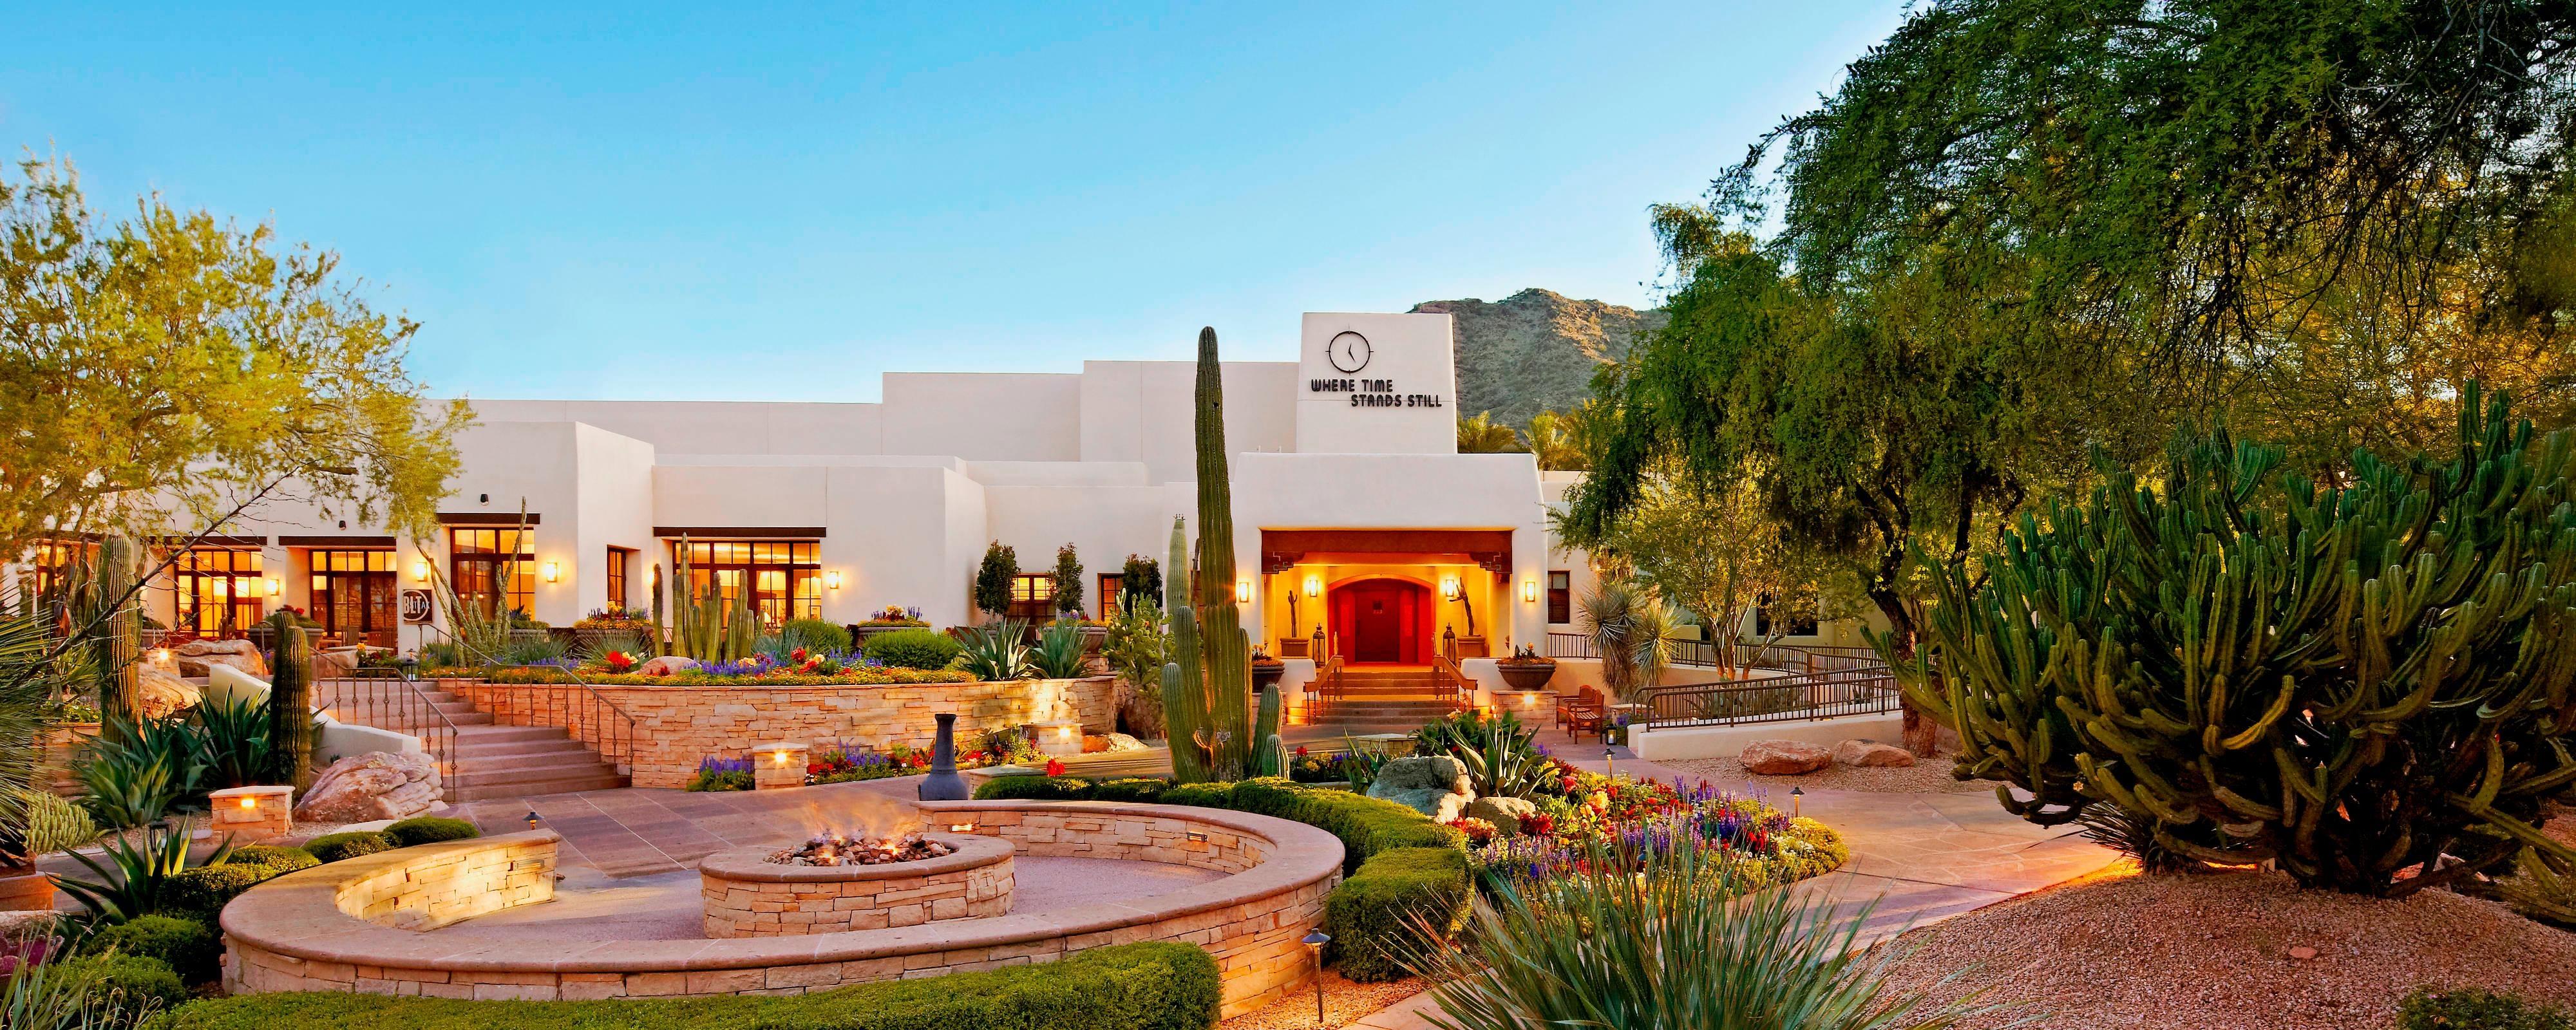 Extérieur du JW Marriott Scottsdale Camelback Inn Resort & Spa